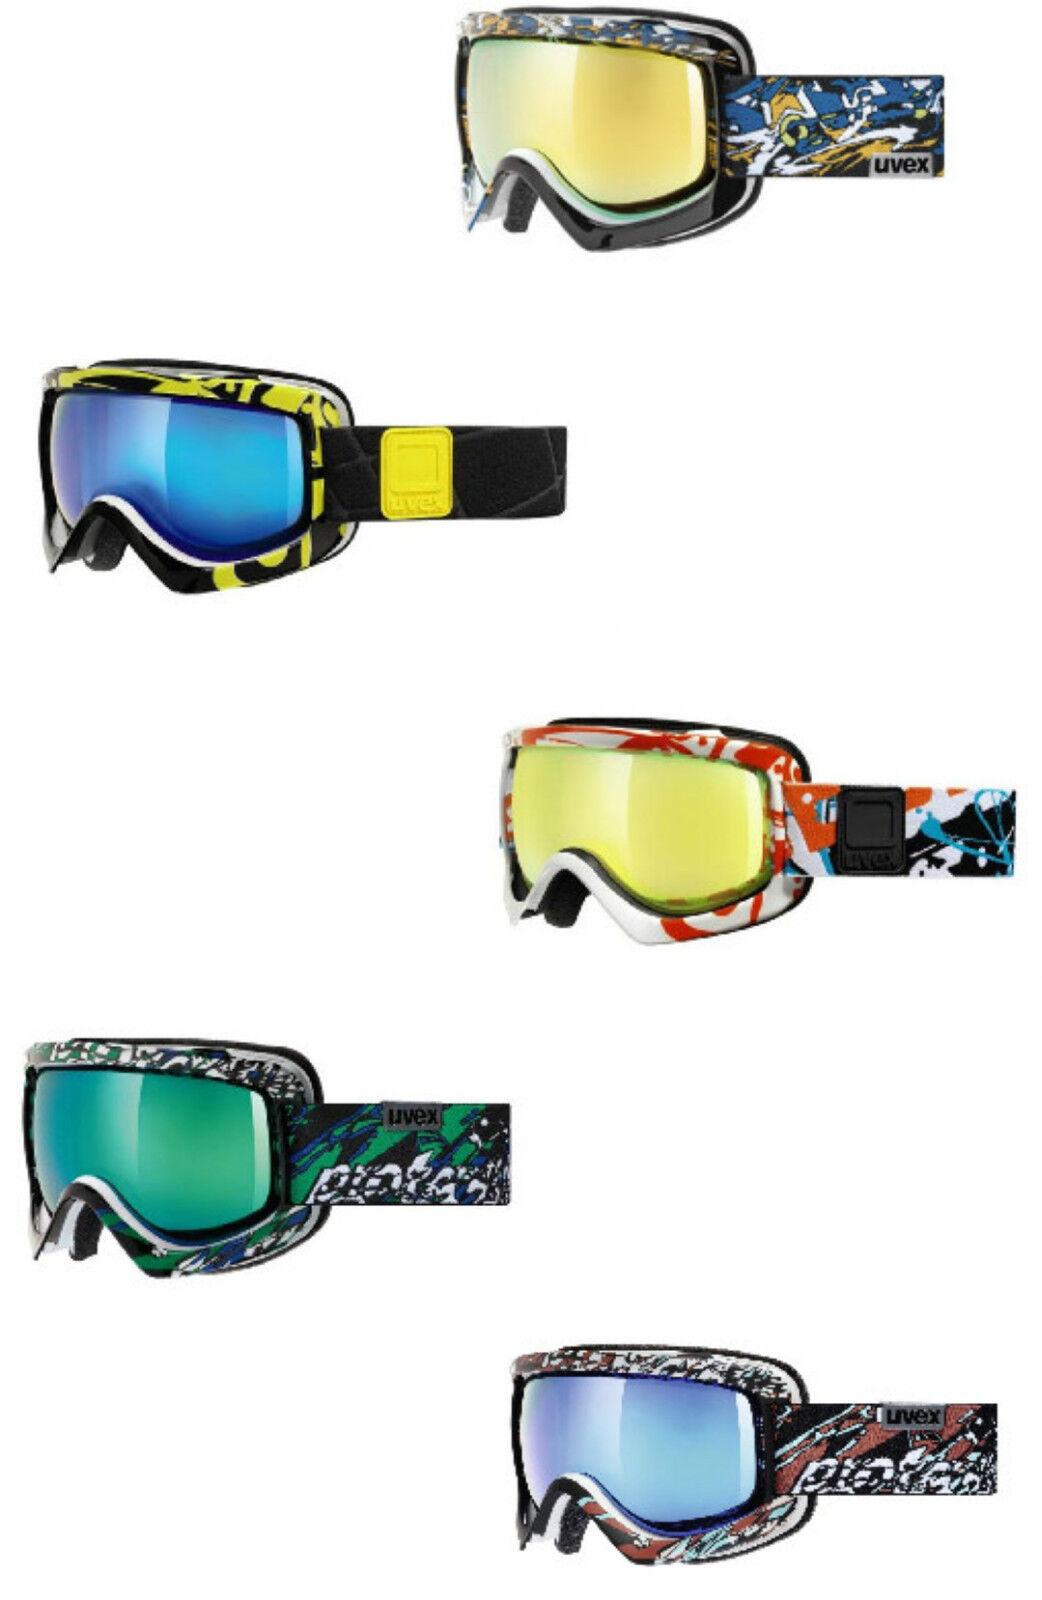 Uvex G.Gl 5 Sioux Cf - Lens Spheric Lite Mirror Ski Goggles Snowboard Glasses